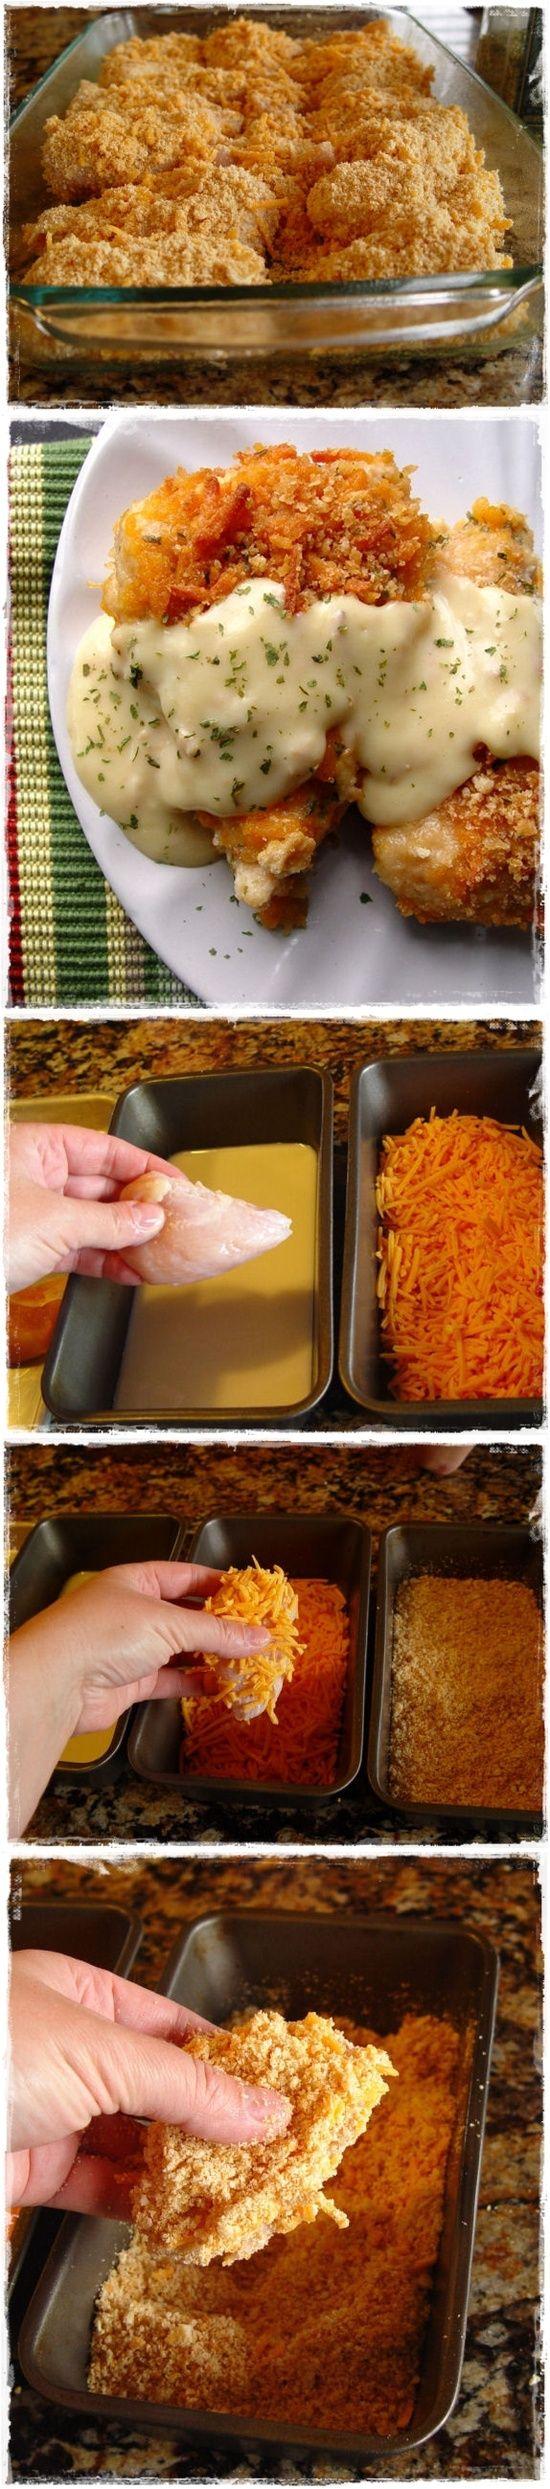 Crispy Cheddar Chicken | Chicken recipes | Pinterest